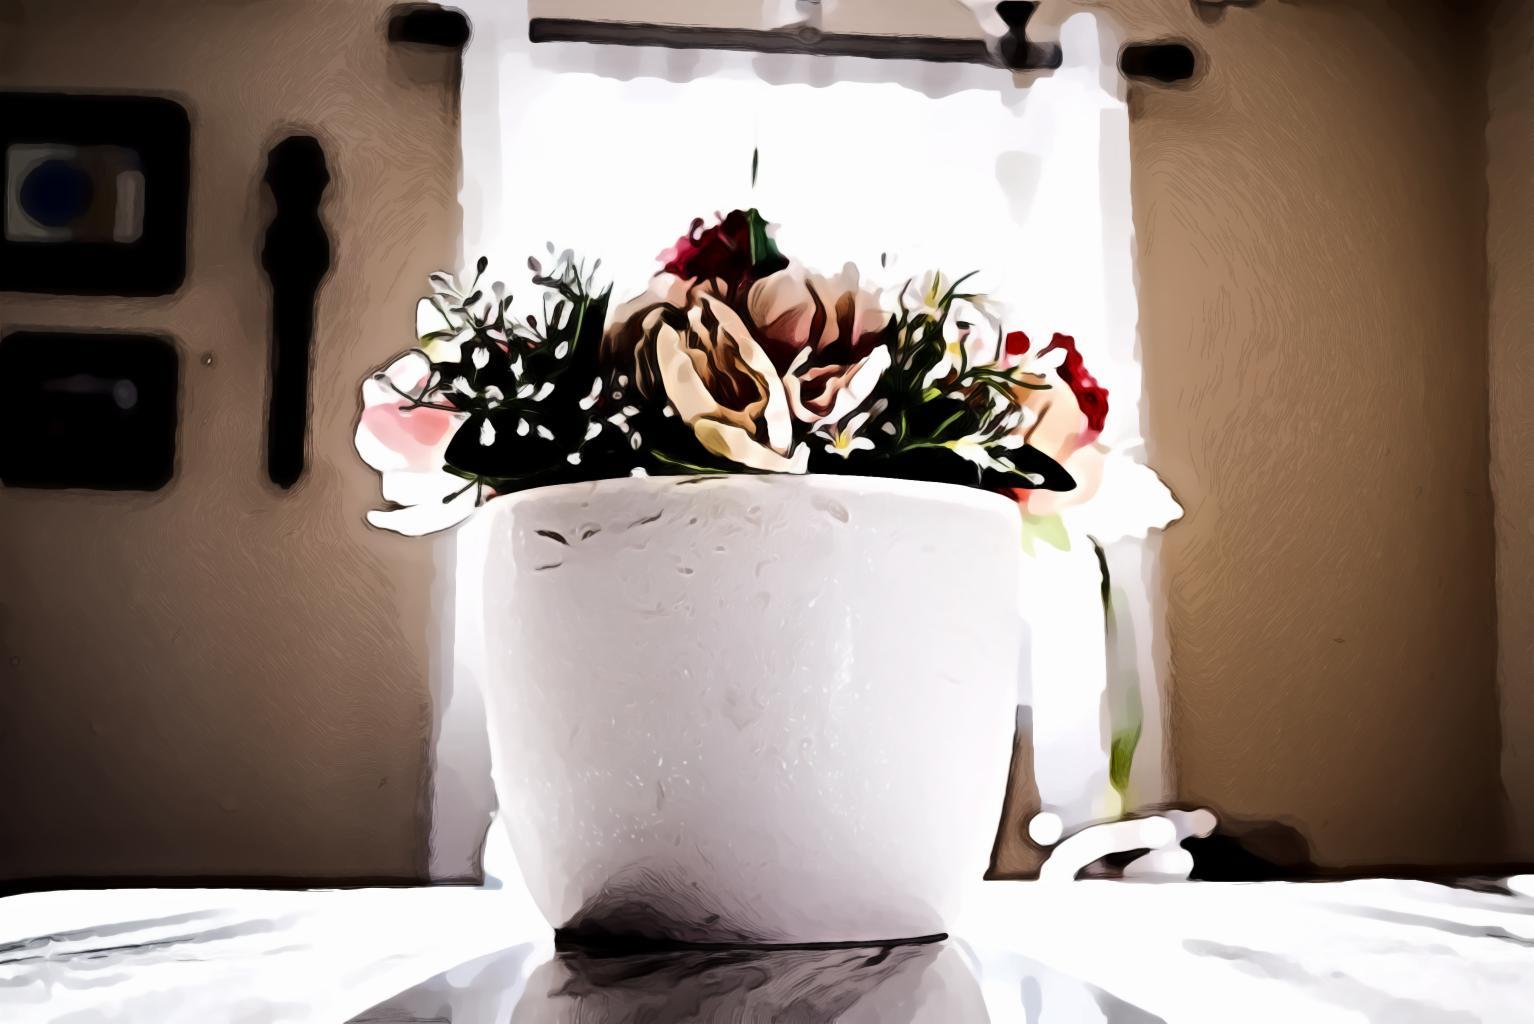 Assorted flowers in white ceramic vase